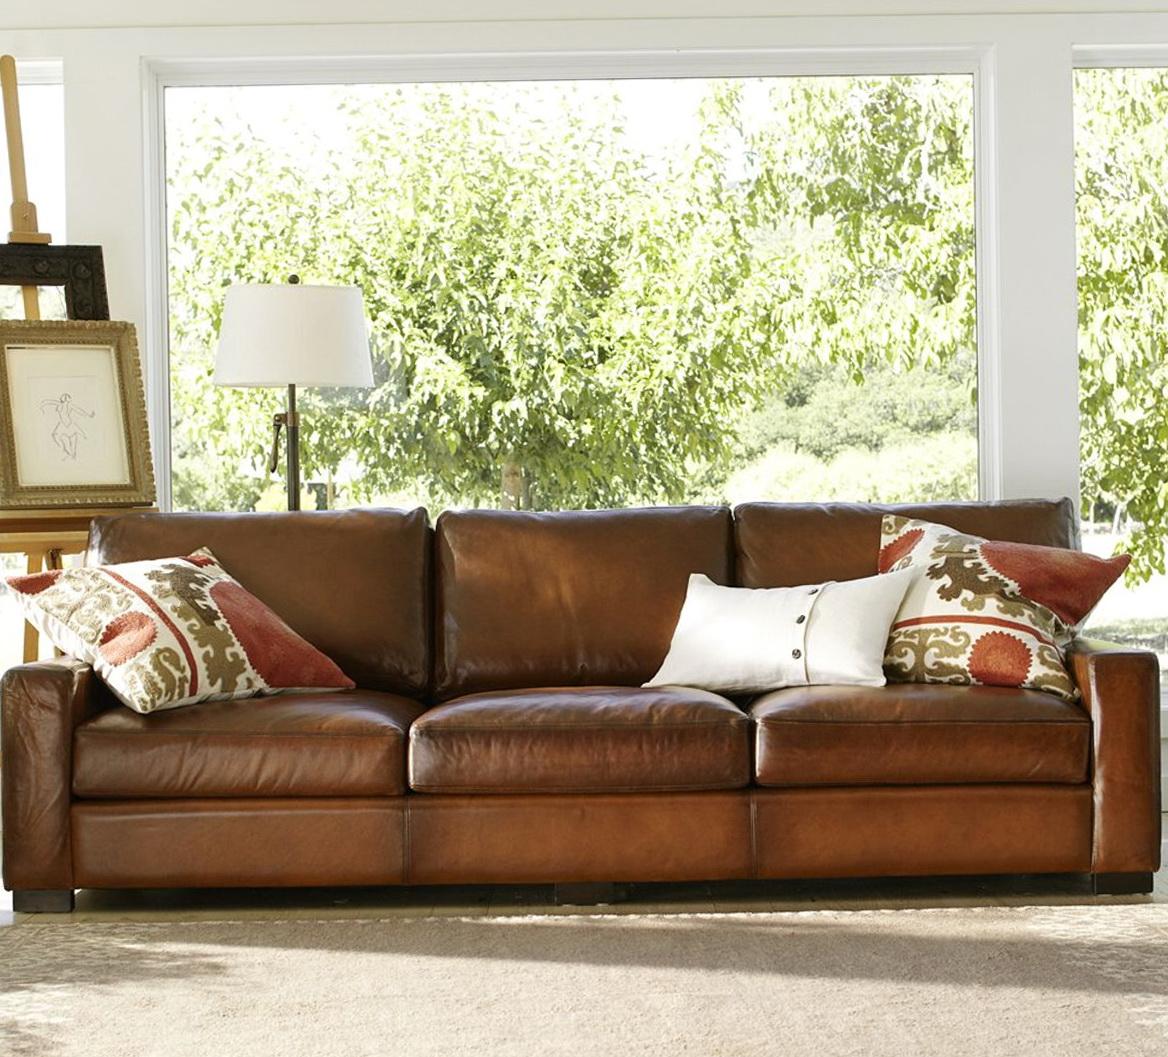 Leather Cushions For Sofa